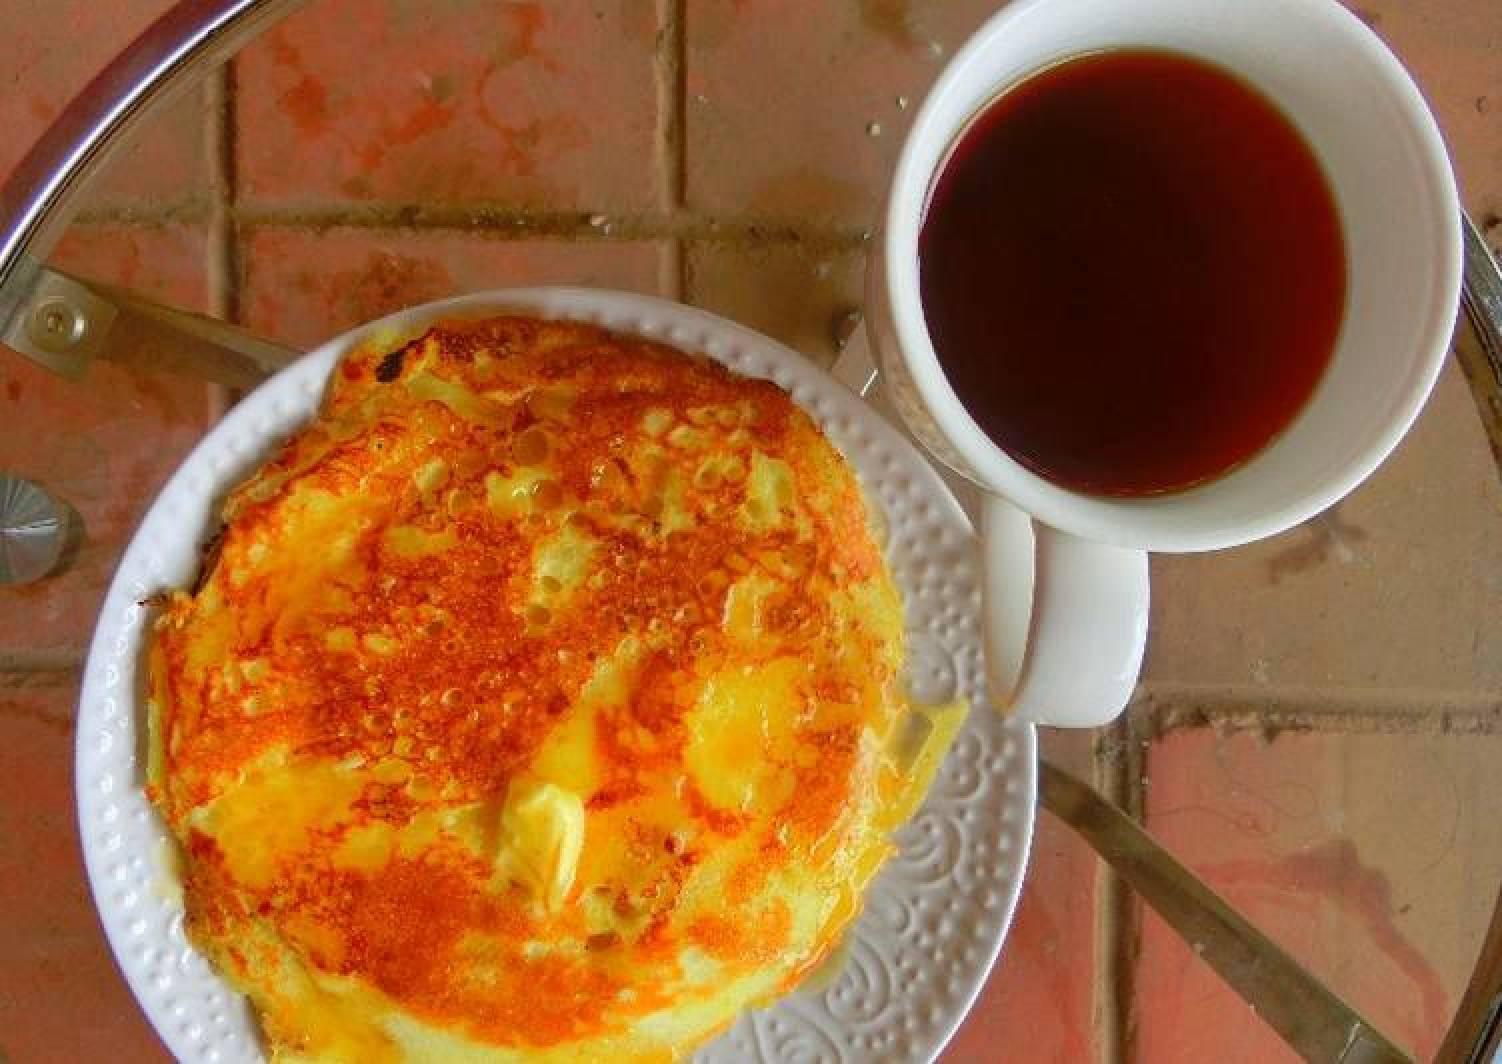 Pancake, butter and hot tea